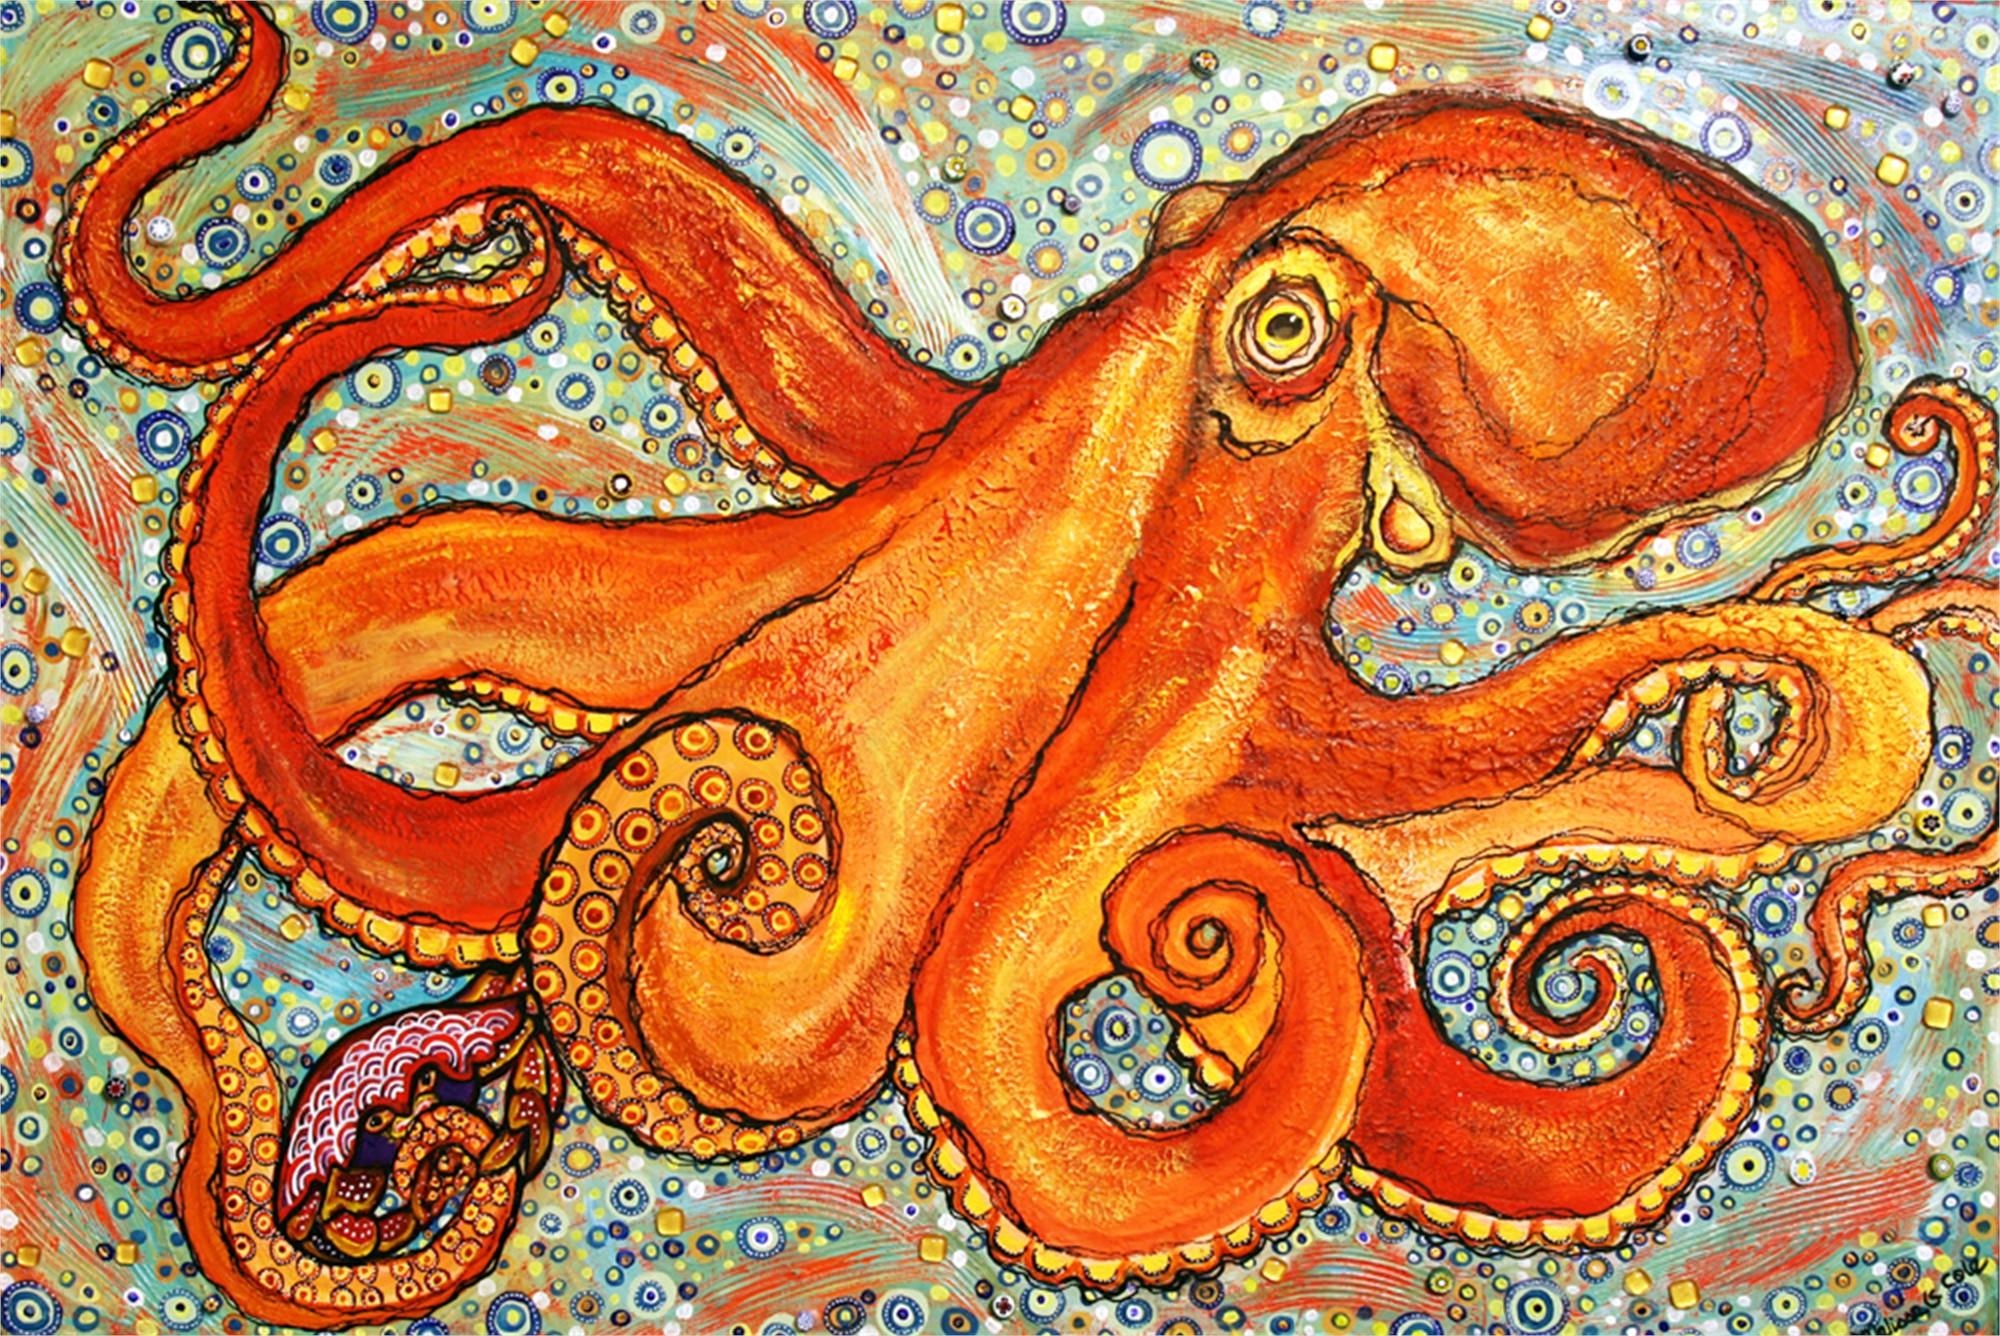 Kraken Snack by Melissa Cole